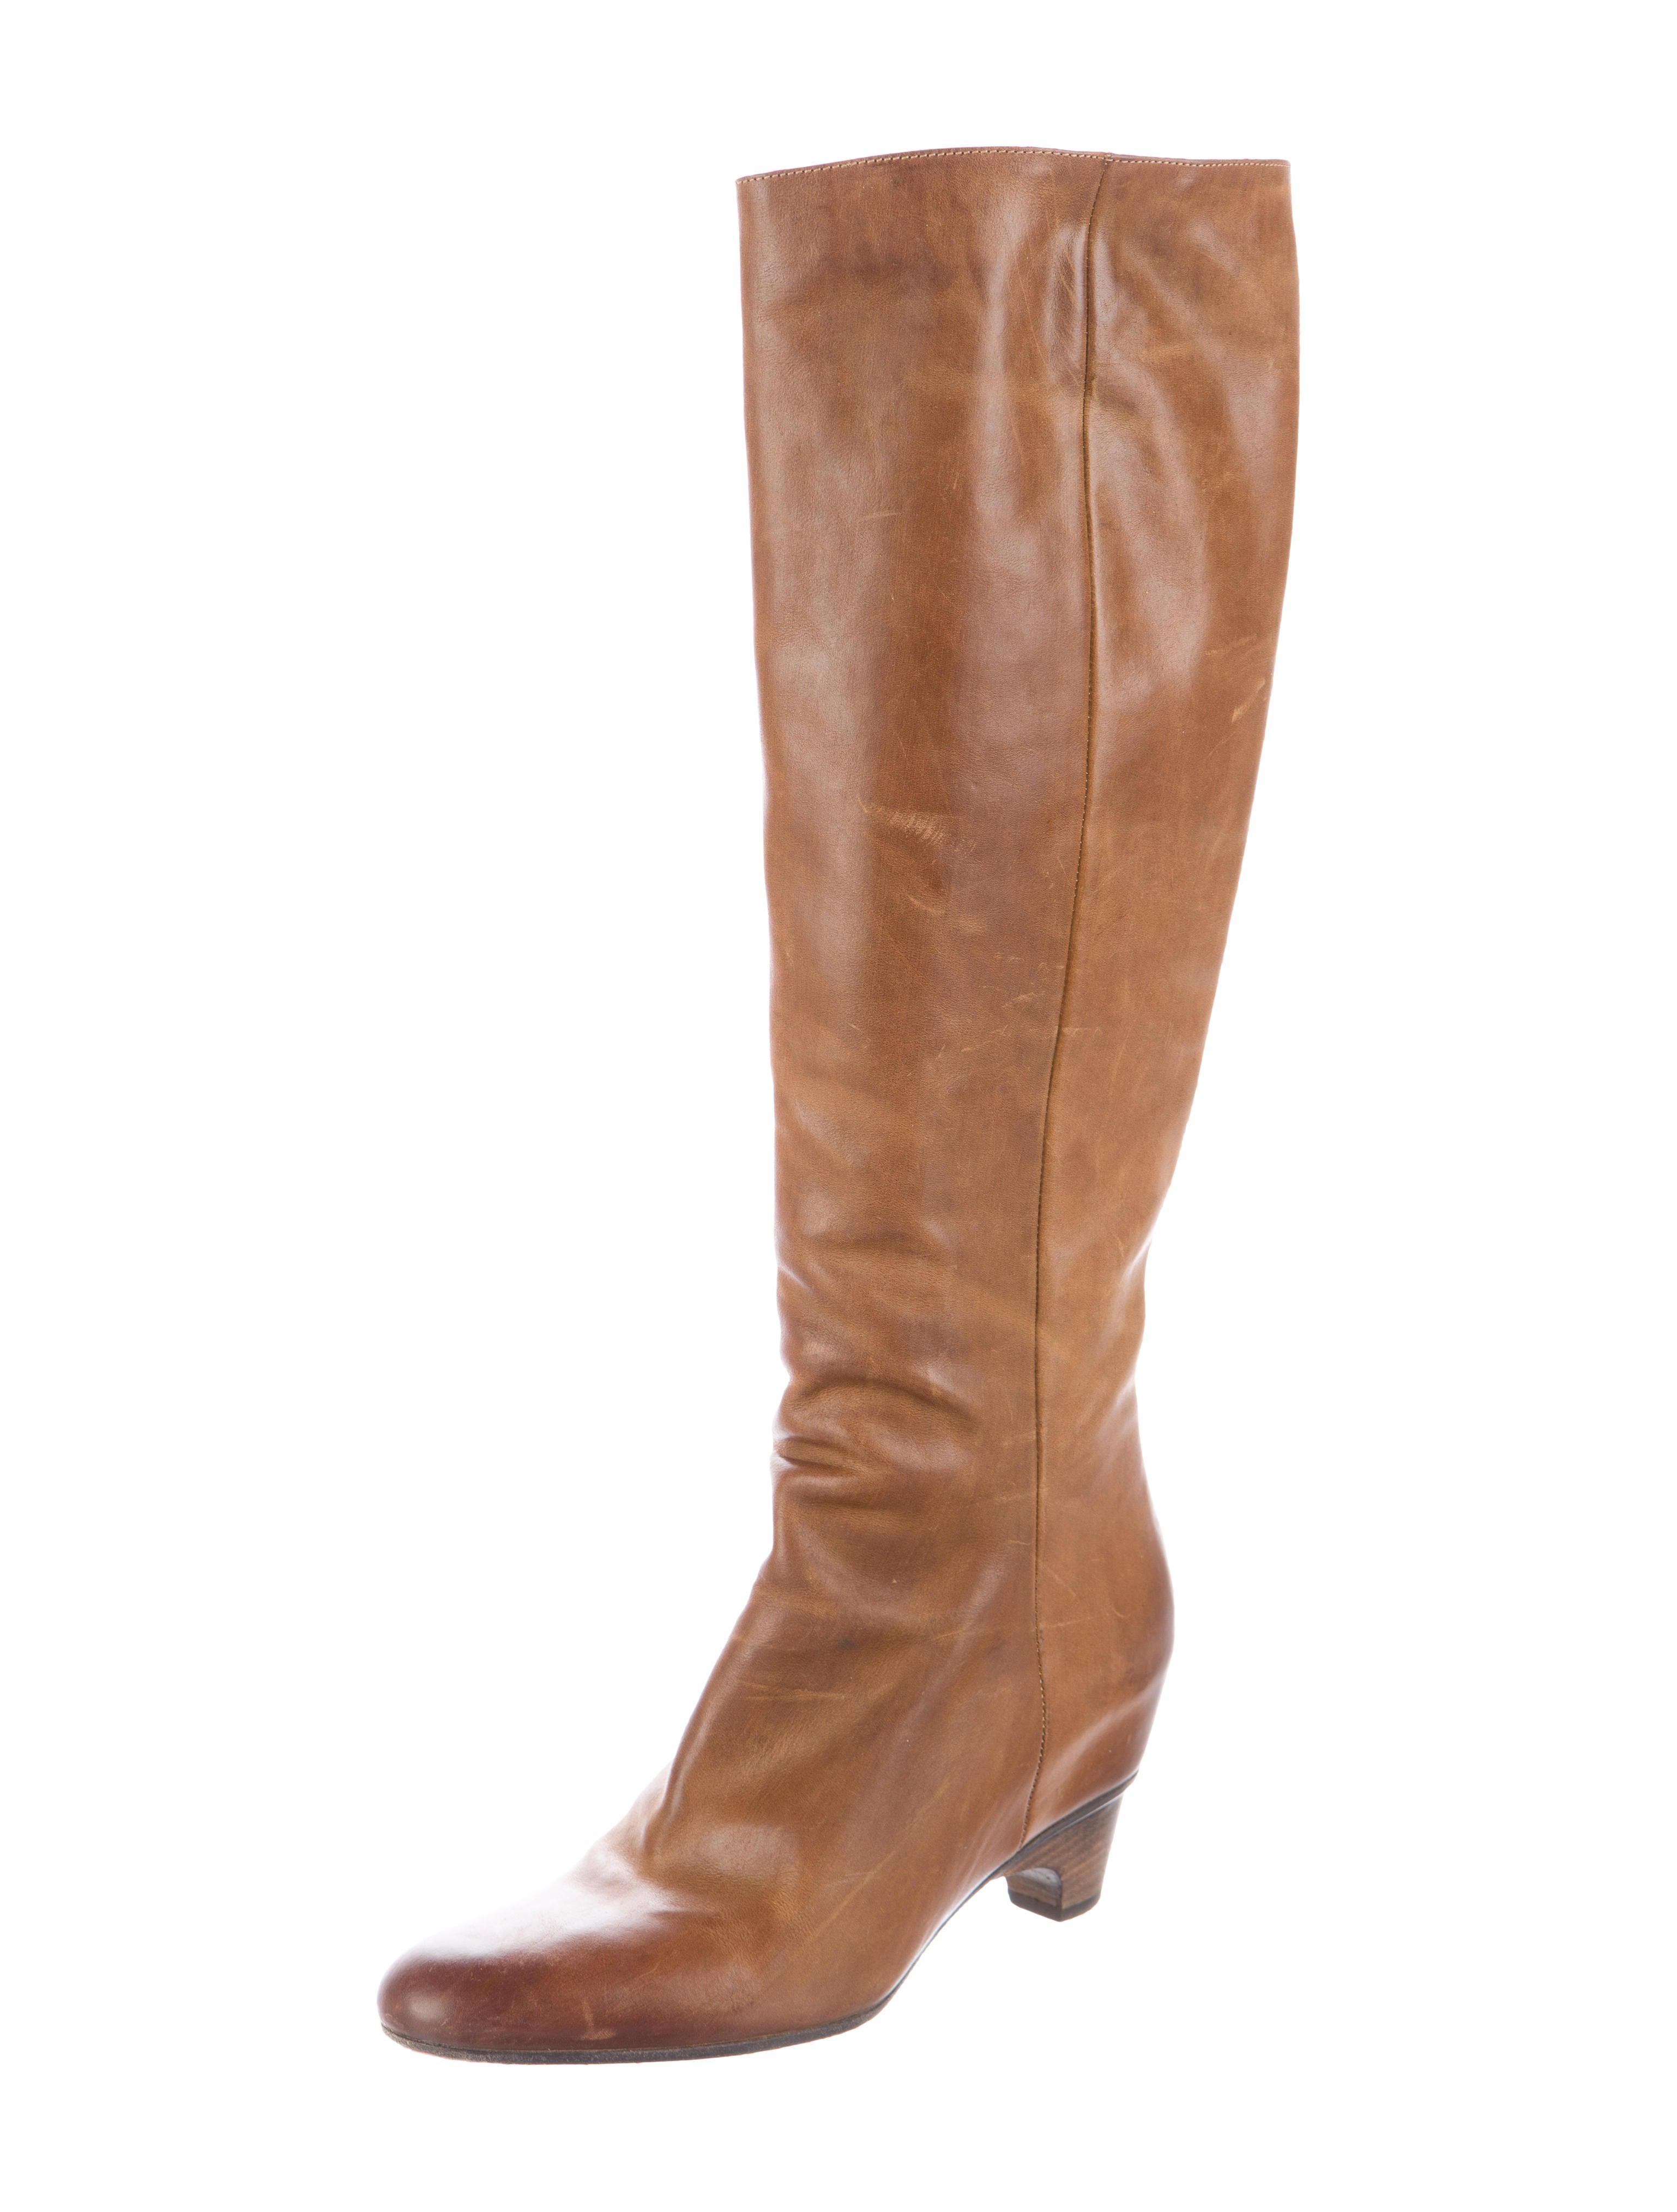 maison martin margiela toe knee high boots shoes